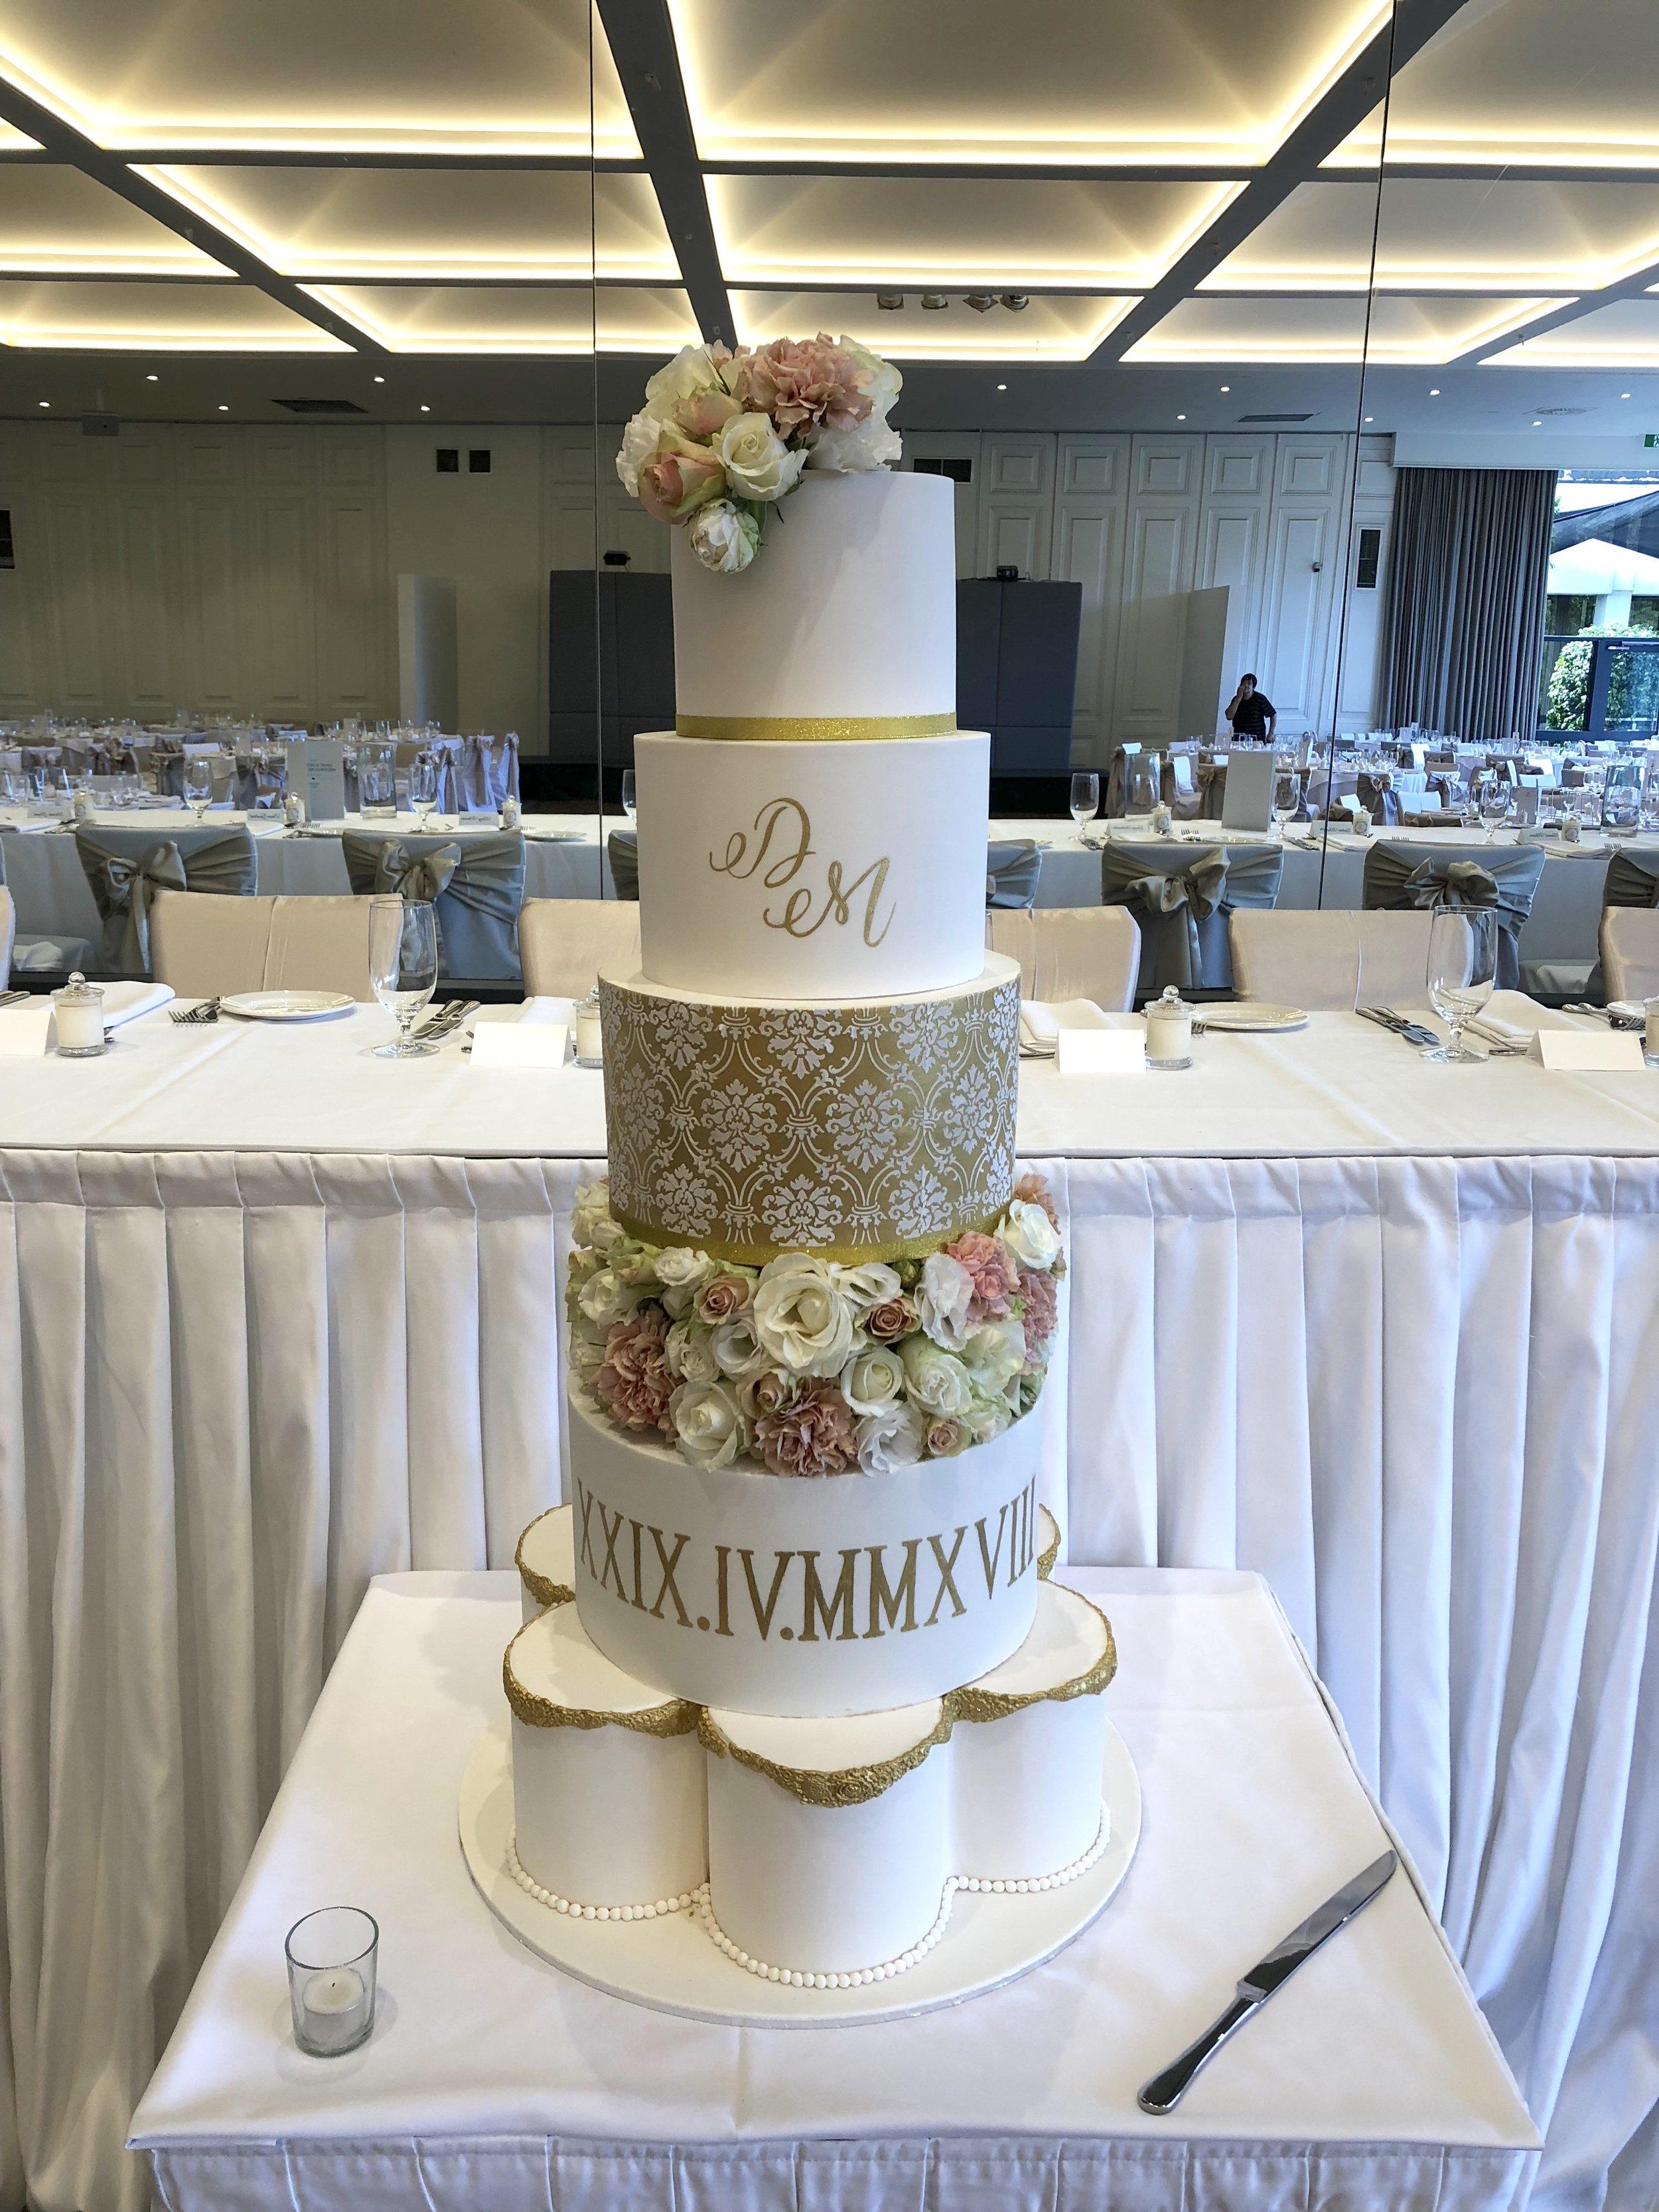 Showstopper Wedding Cake